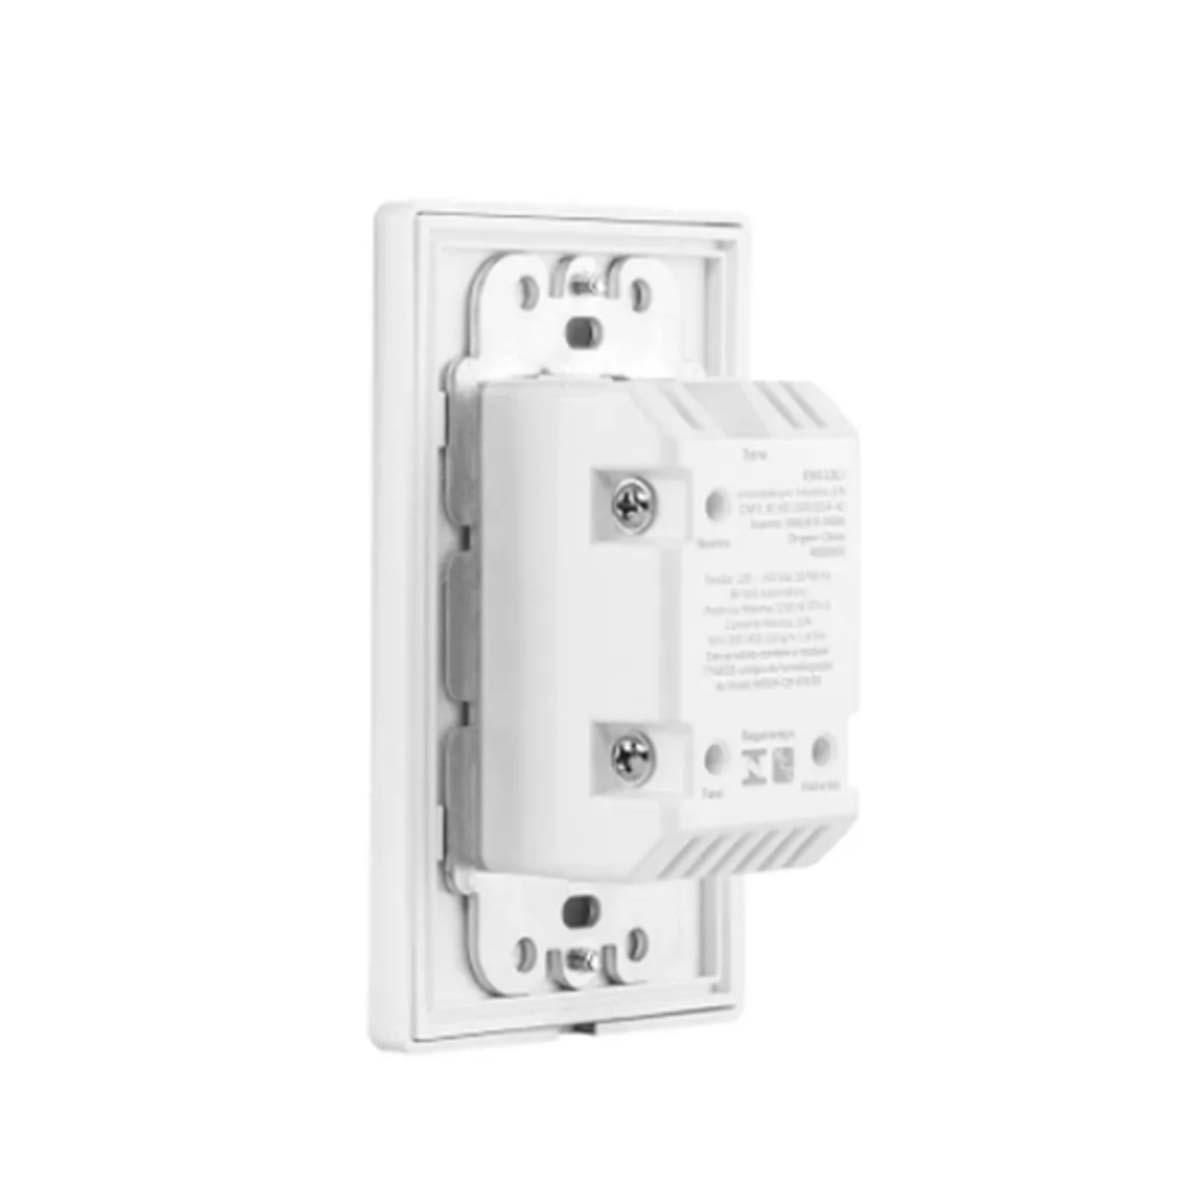 Kit 03 Interruptor Inteligente Intelbras Wi-Fi Ews 101 I